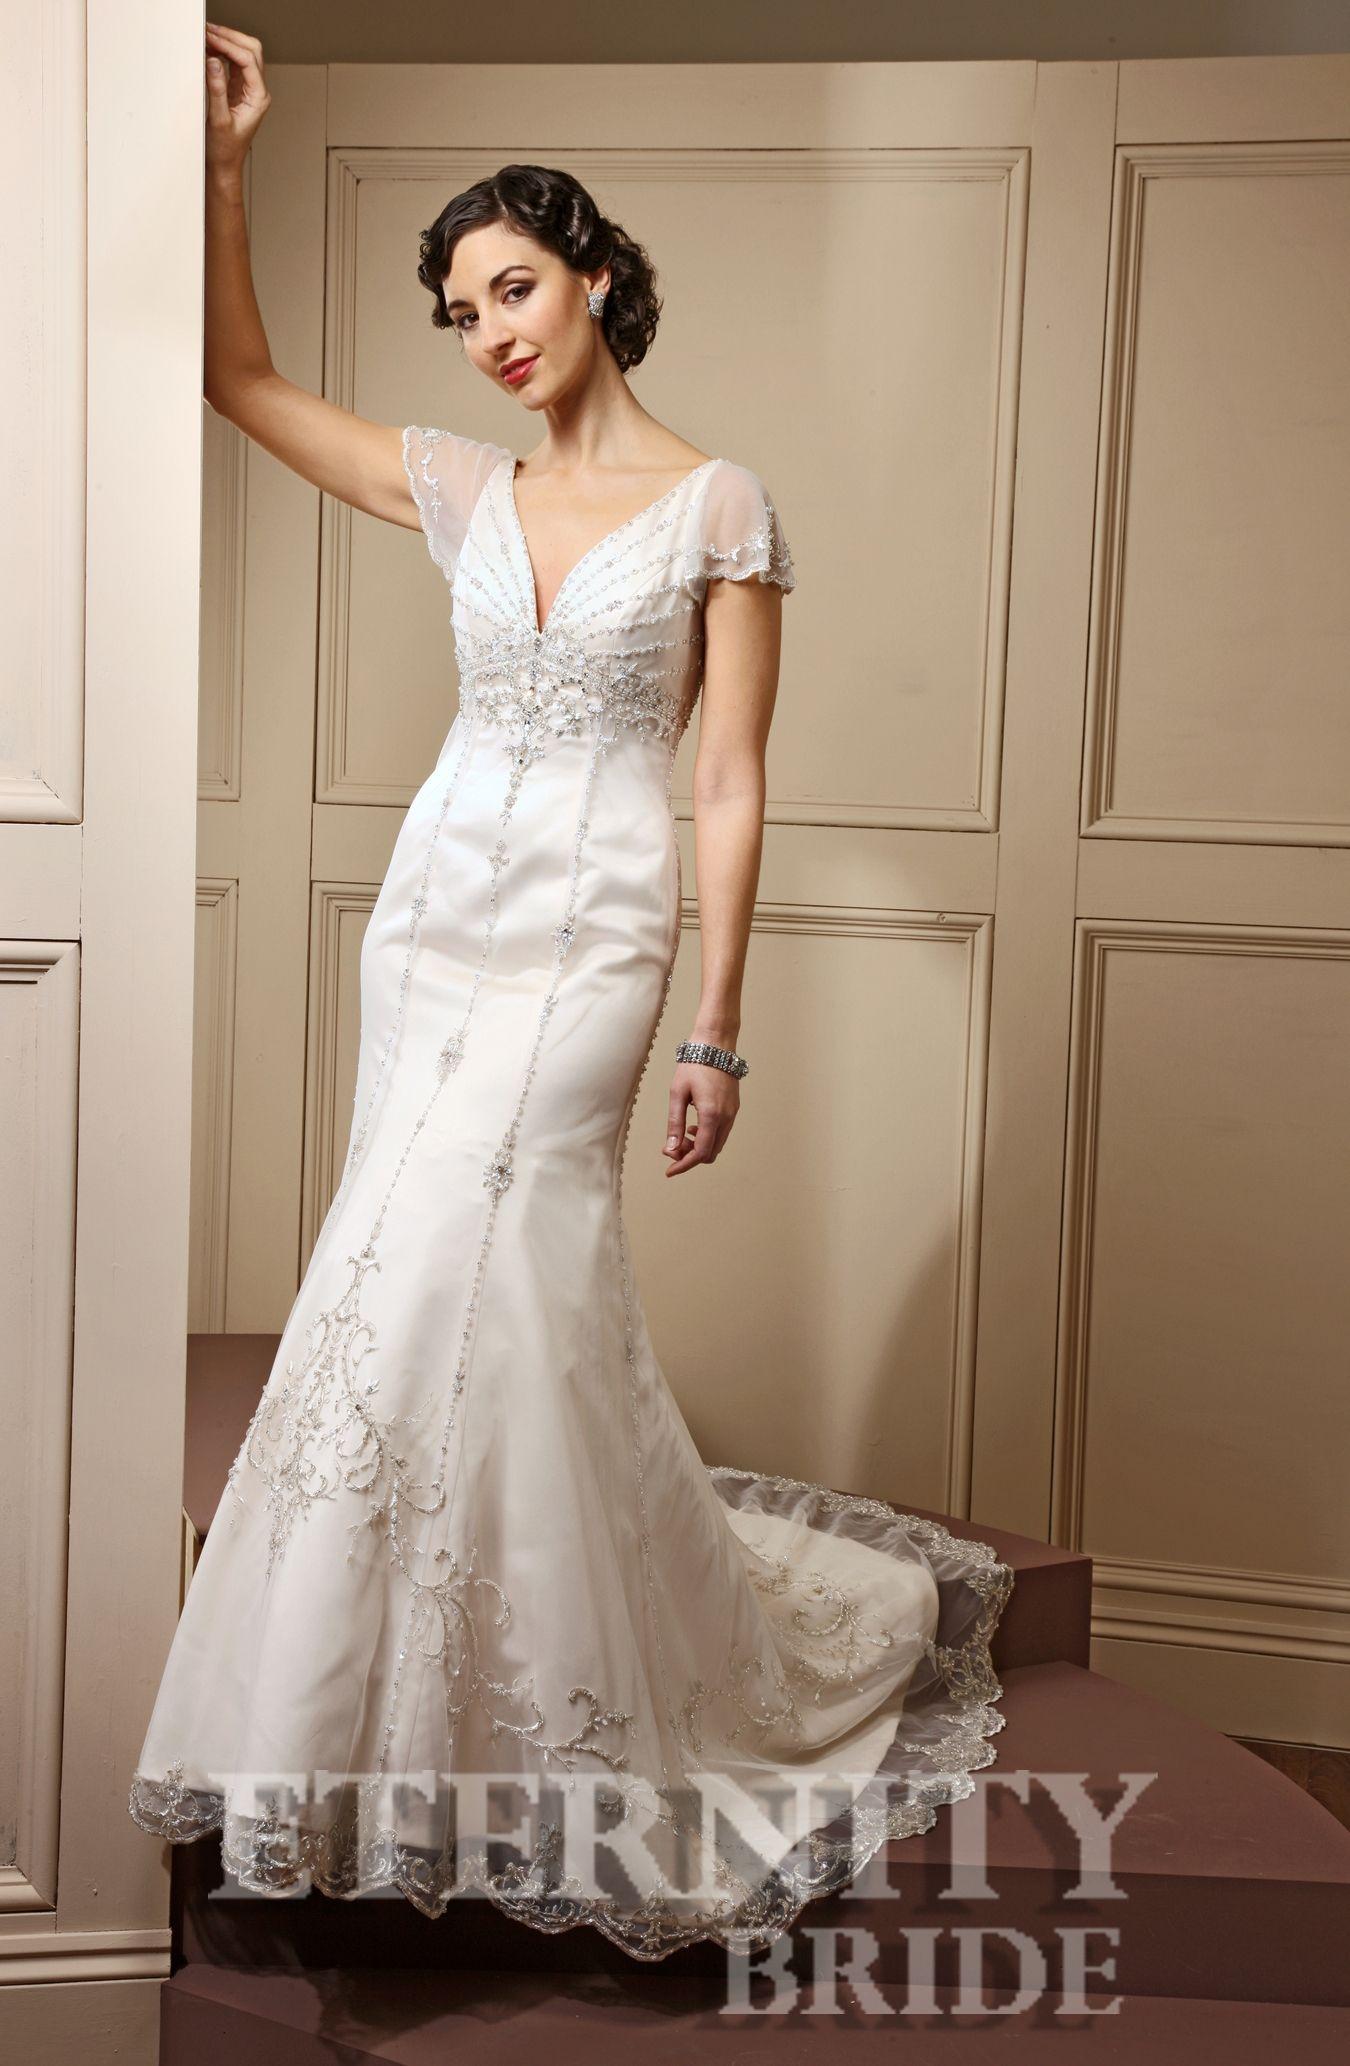 D5083 - Wedding Dresses - Eternity Bride - Weddingspot.co.uk ...